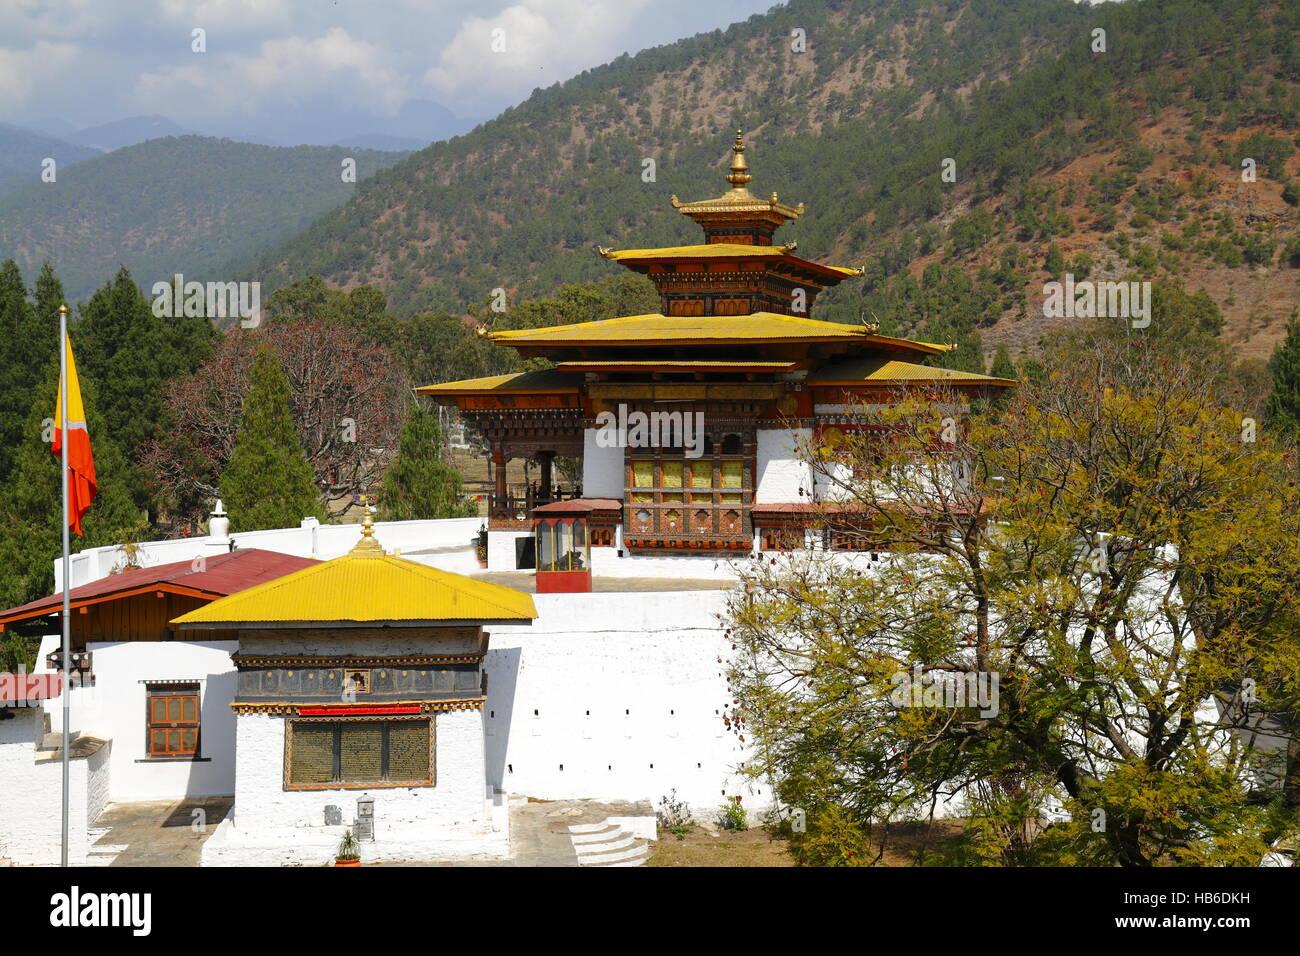 The Punakha Dzong - Stock Image